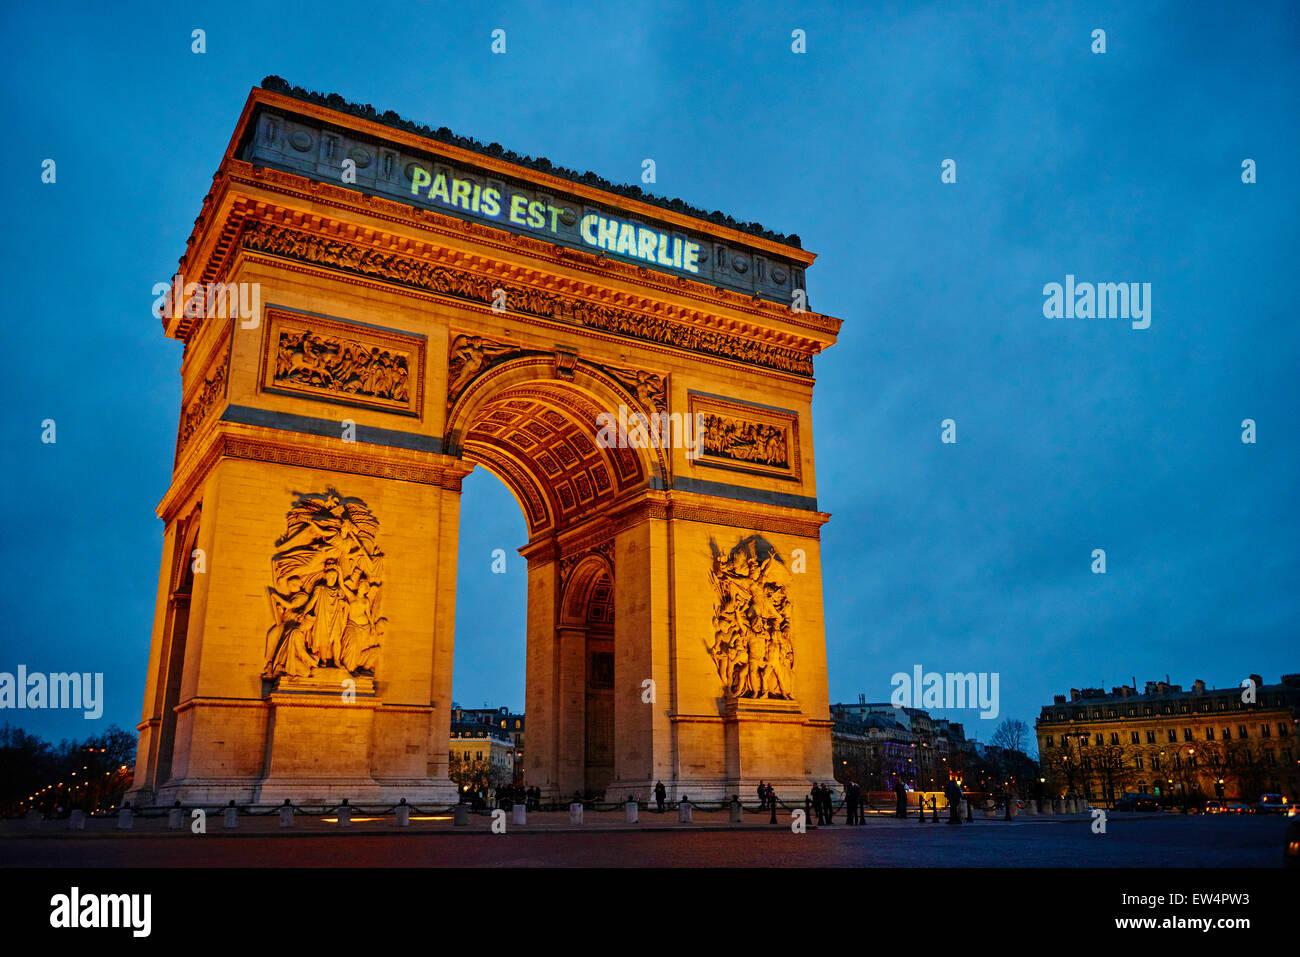 Francia, Parigi, 11 gennaio 2015 Parigi è Charlie, per Charlie Hebdo, Arc de Triomphe Immagini Stock